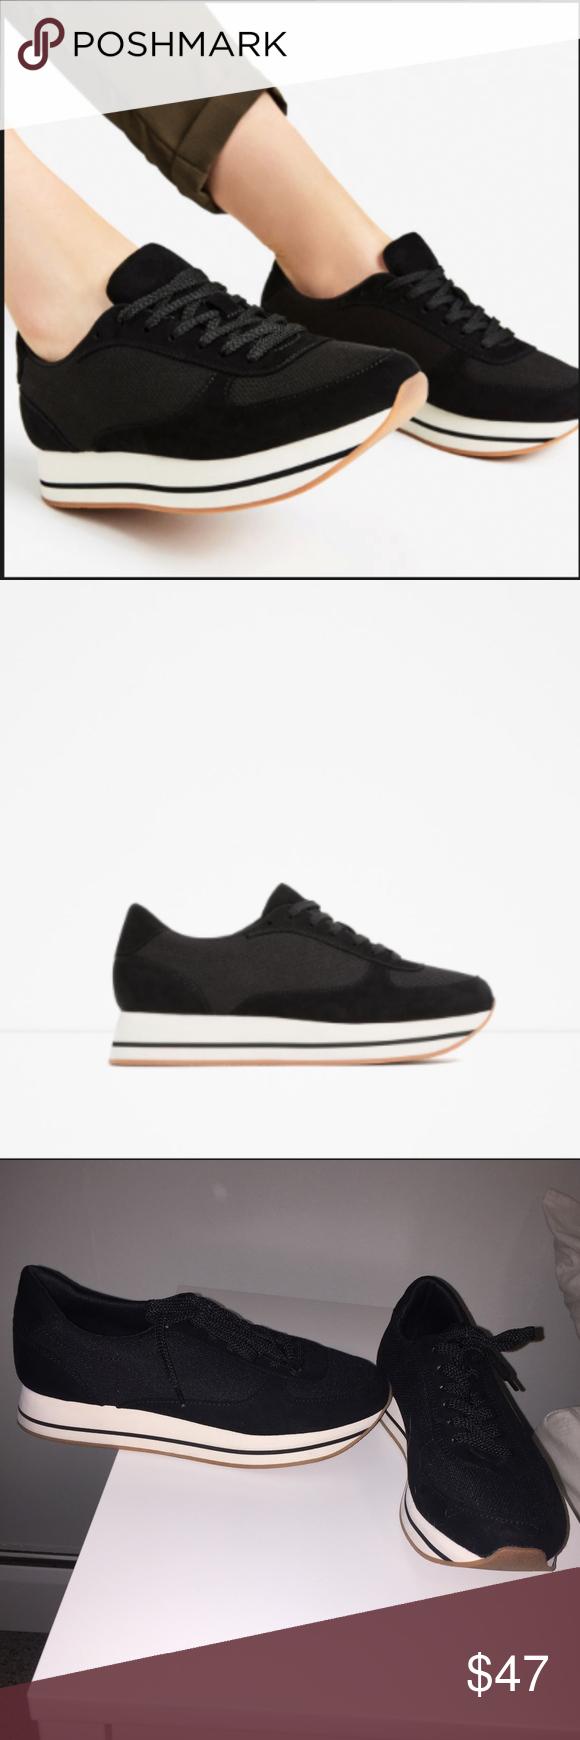 Zara Black Platform Sneakers Mesh